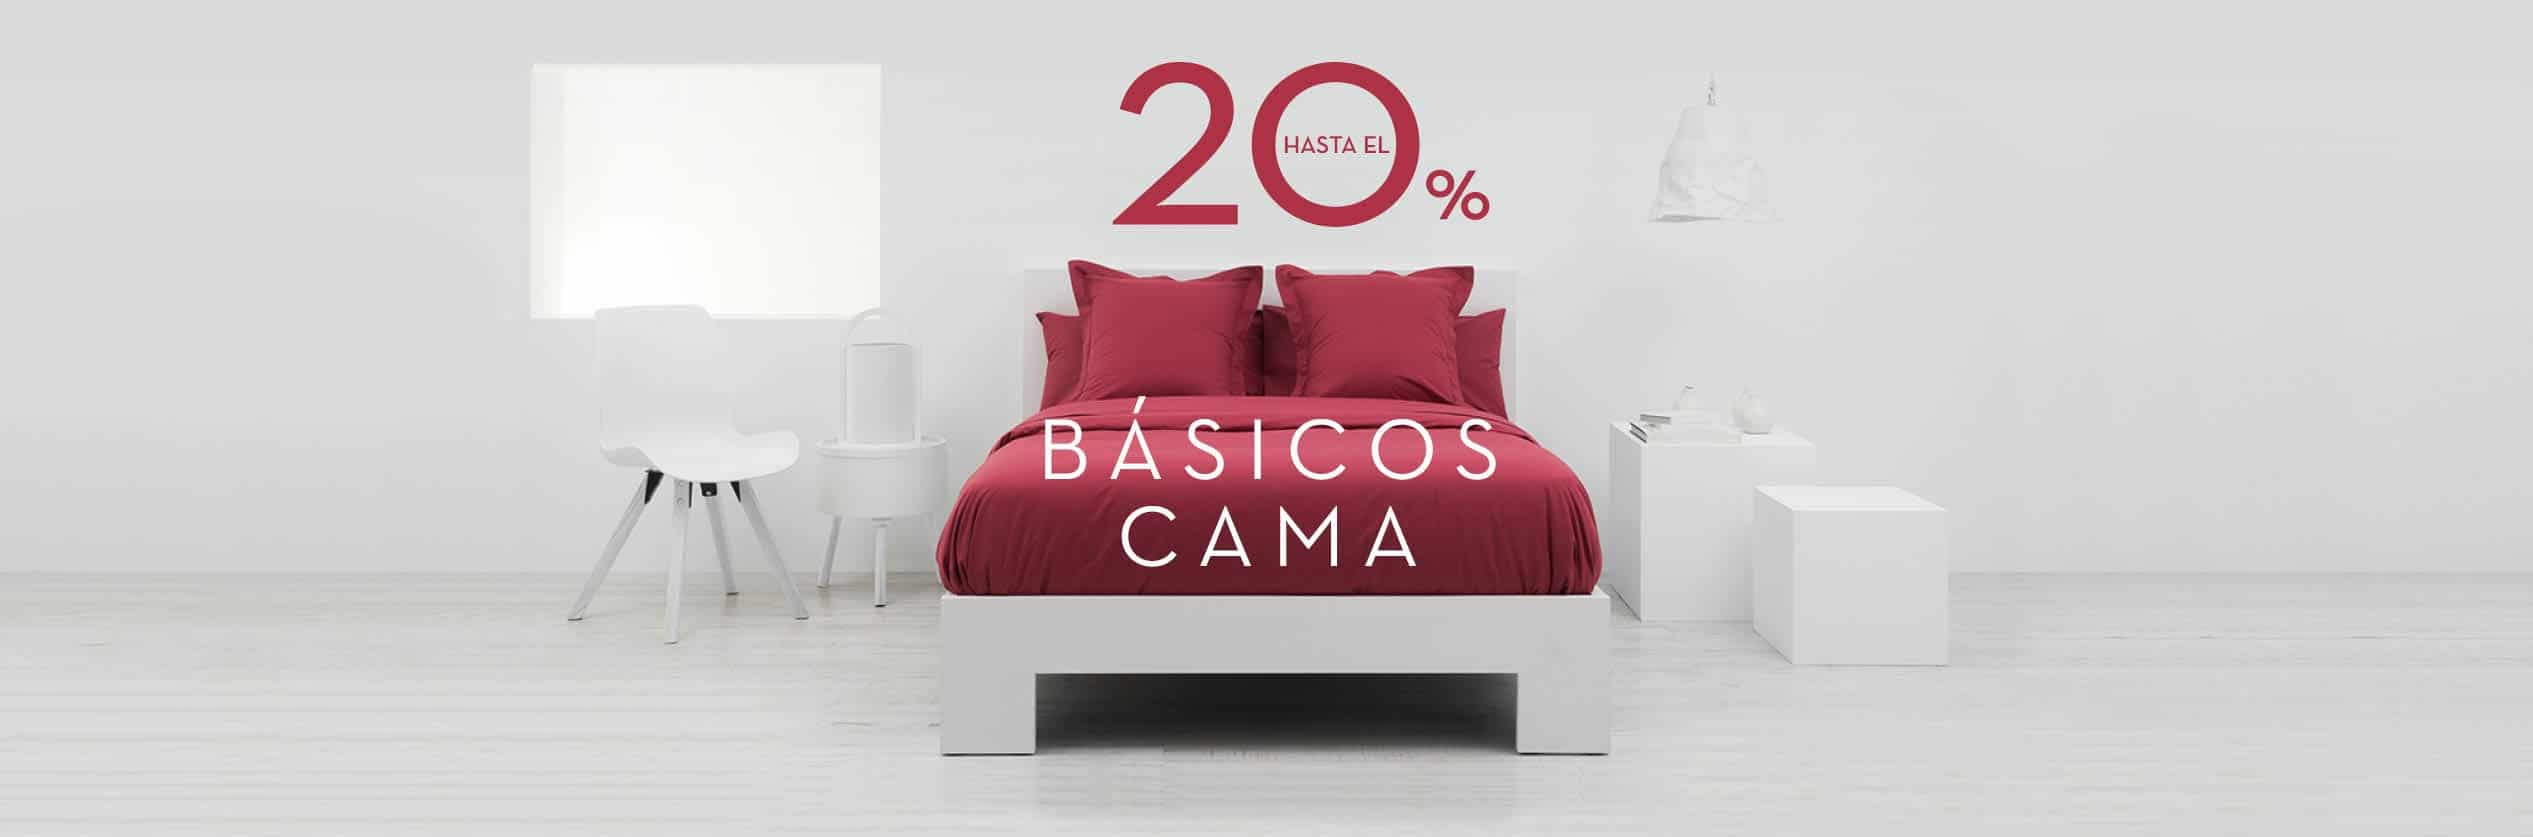 PROMOCIÓN BASICOS CAMA HASTA 20% DTO